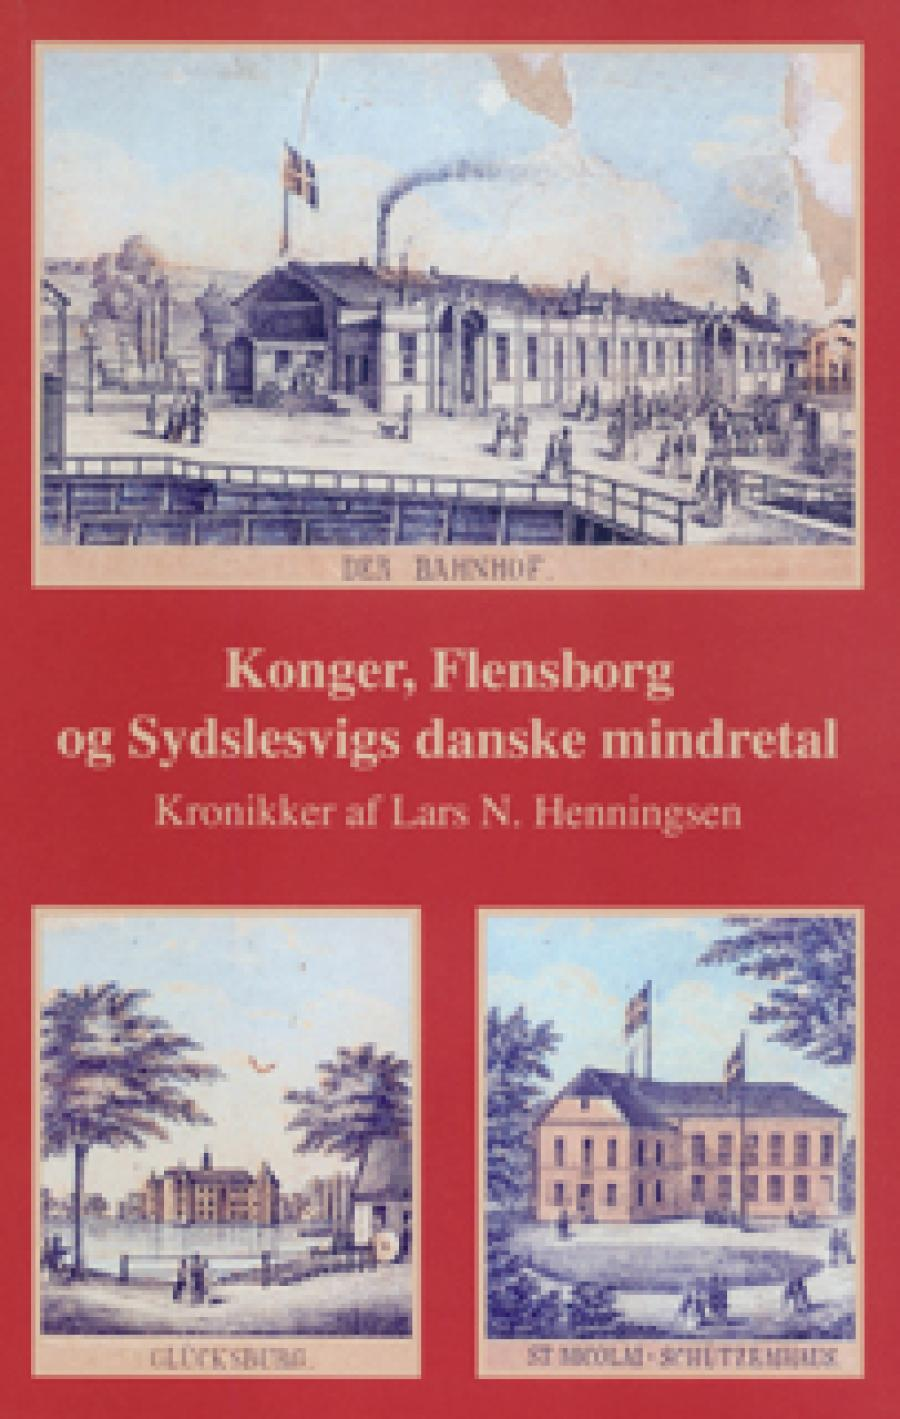 Konger, Flensborg og Sydslesvigs danske mindretal